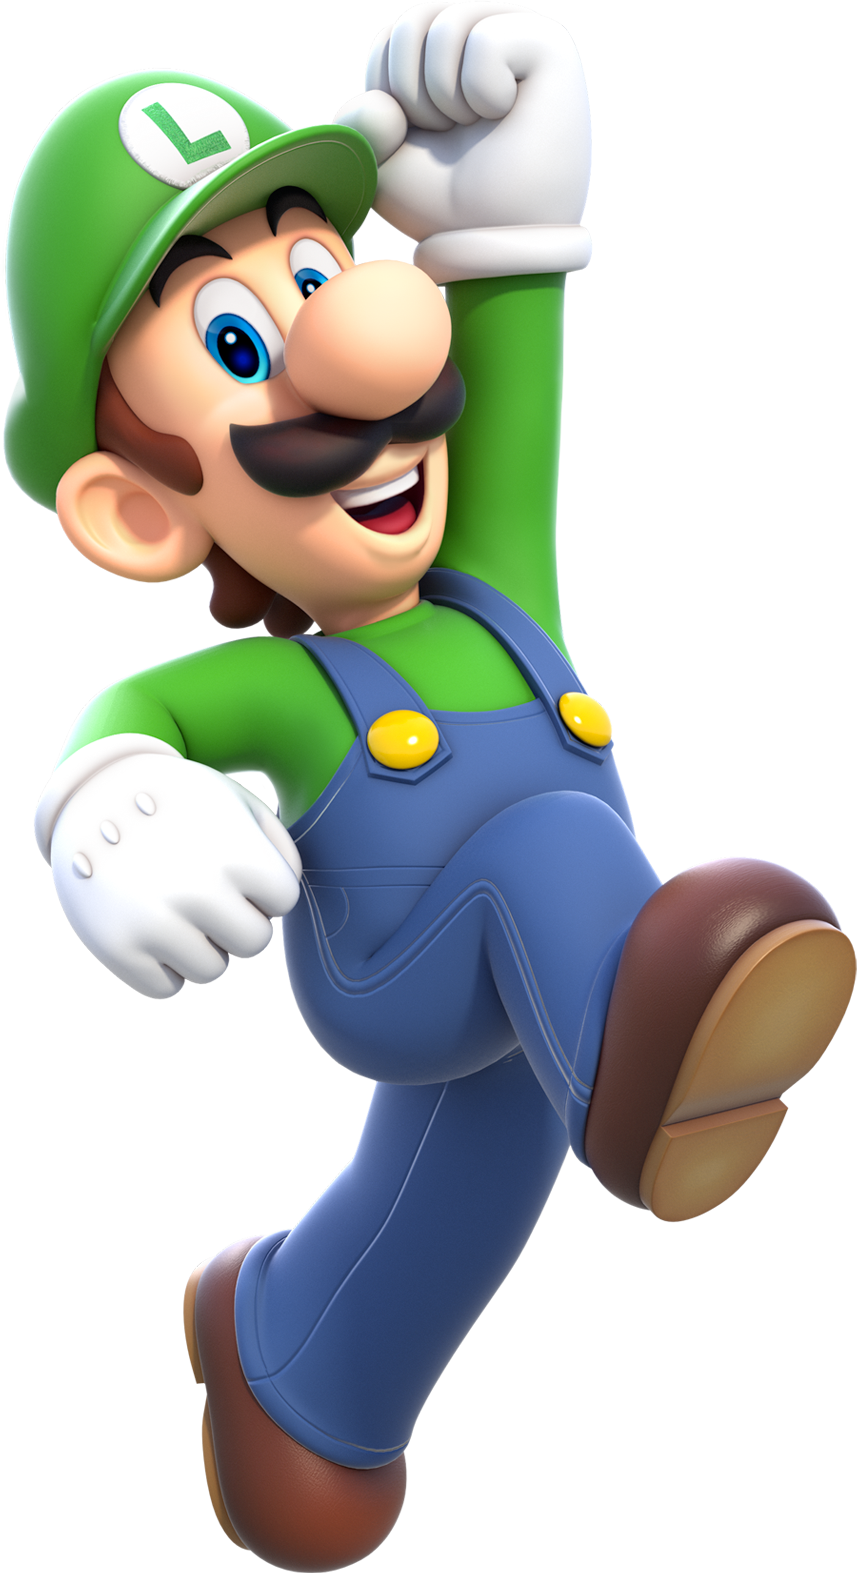 Luigi Cake Images